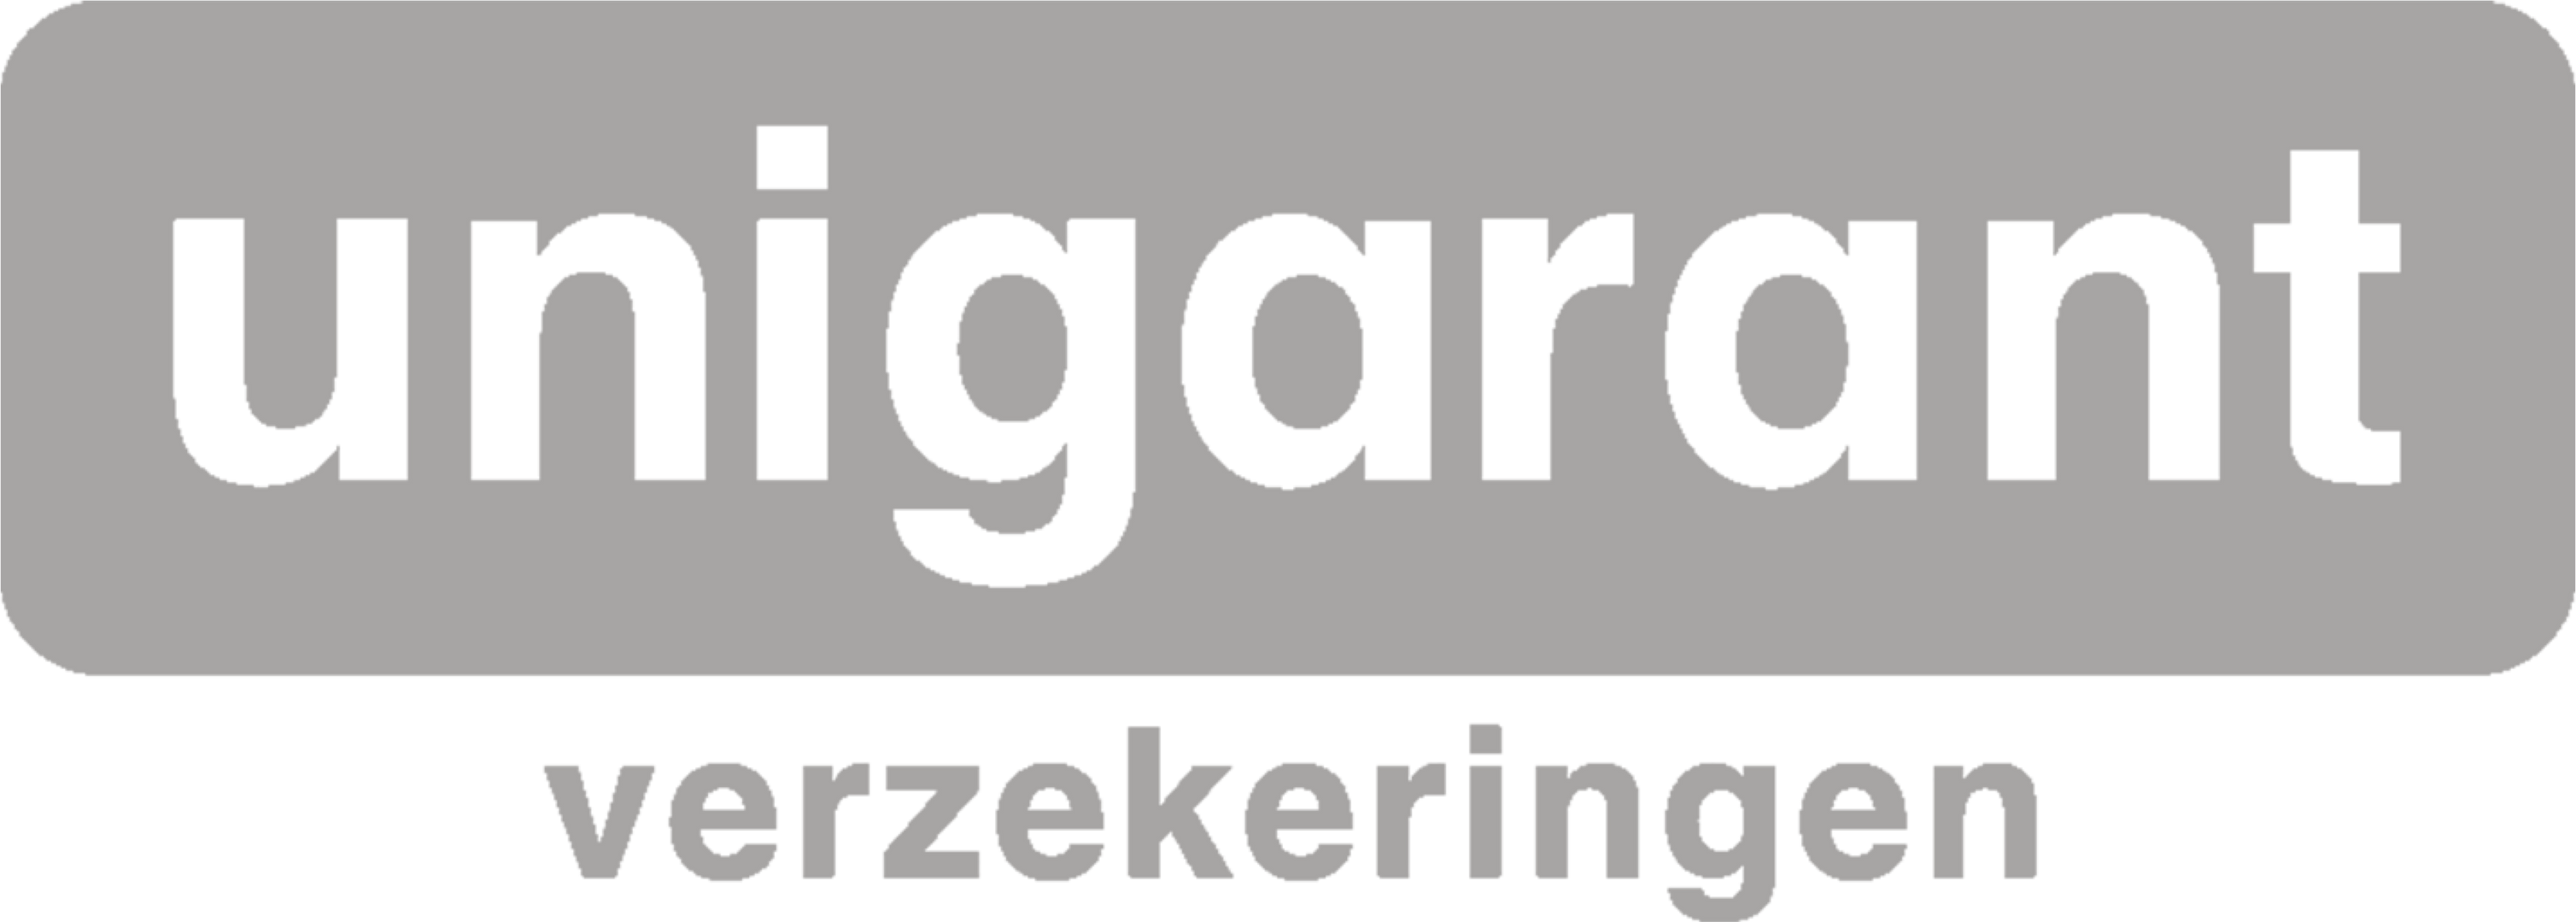 grey-Unigarant-logo.png